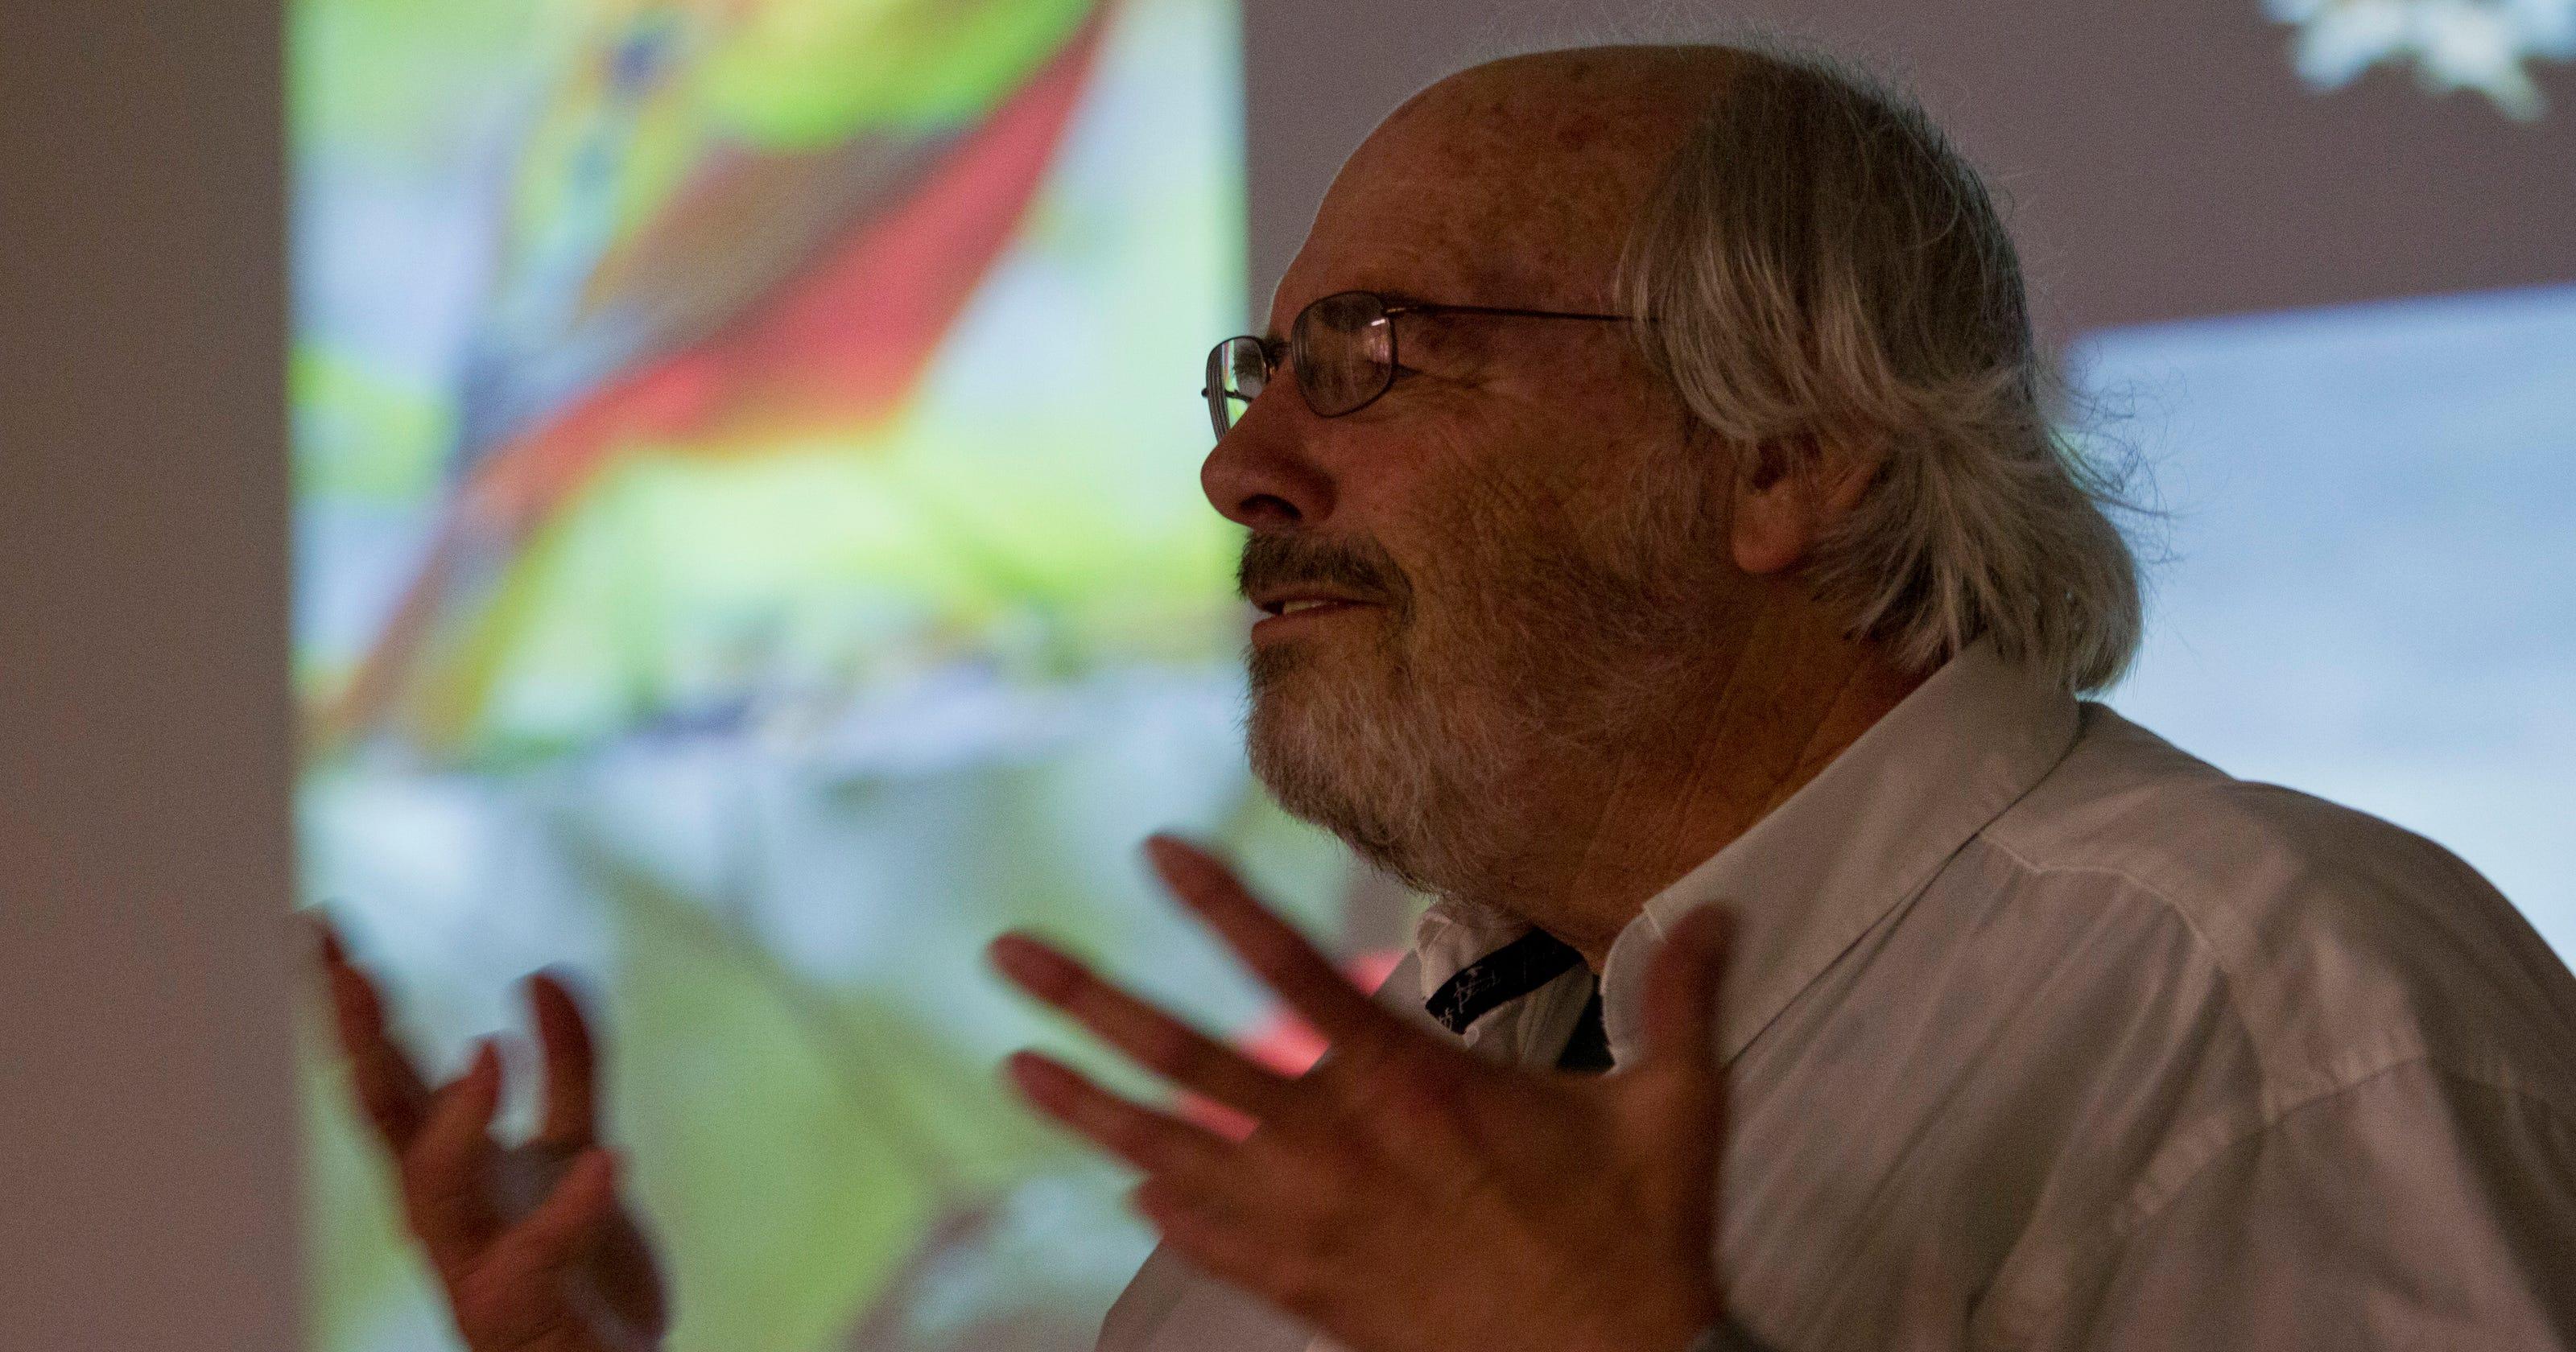 Jack Horner: Dinosaurs likely behaved like birds